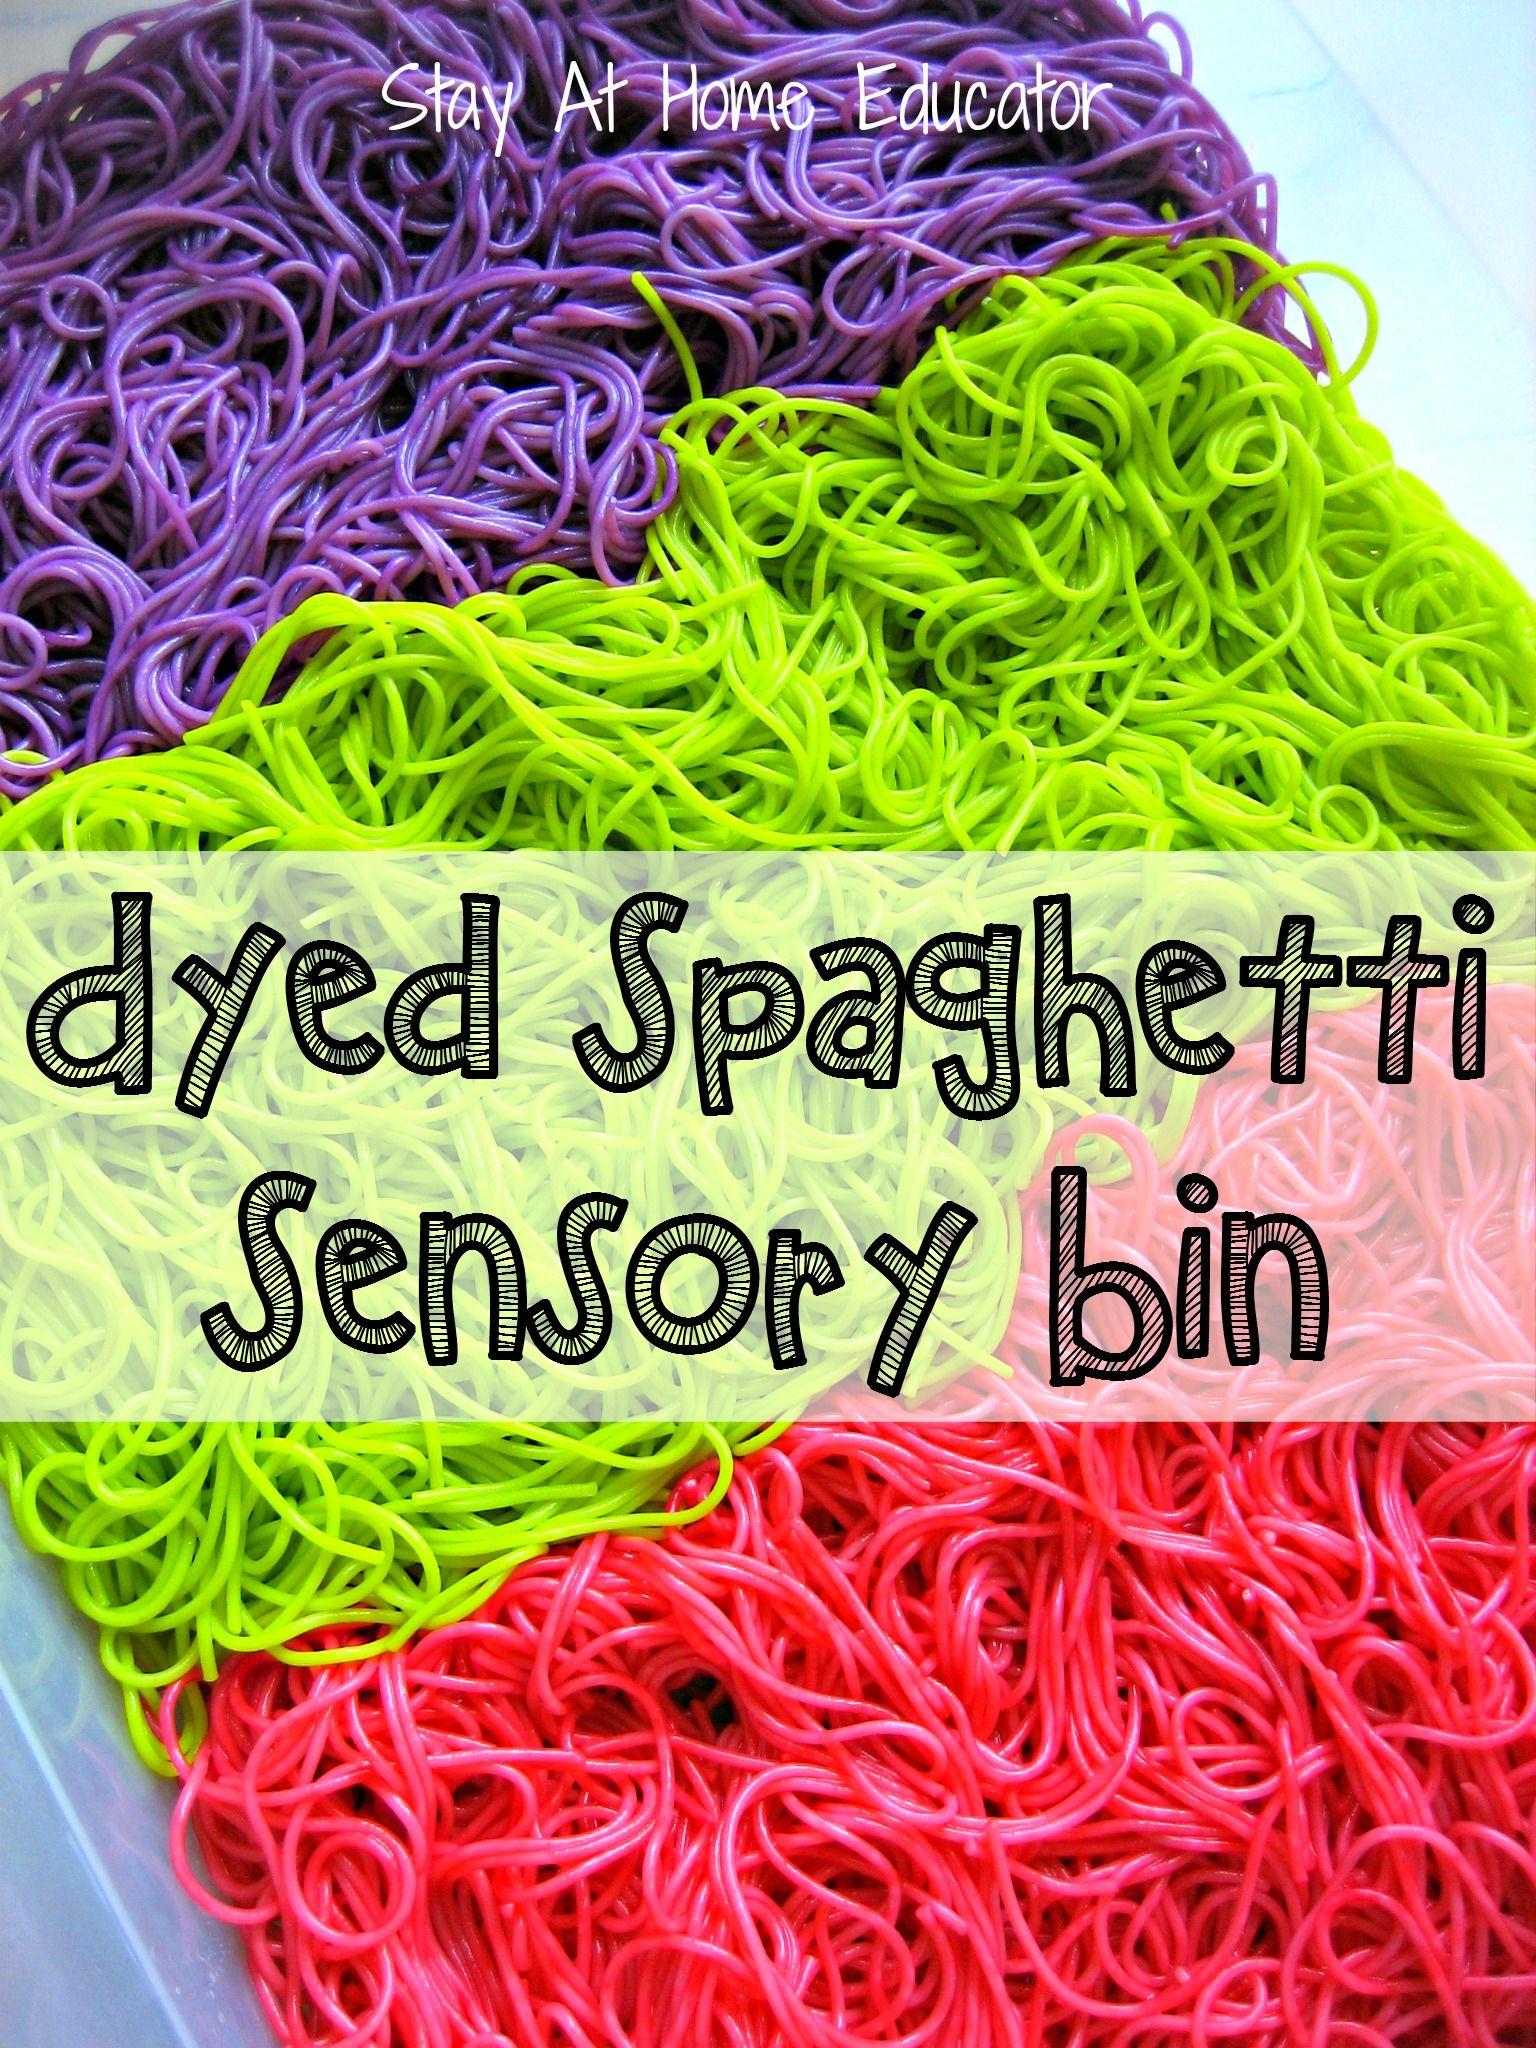 Dyed Spaghetti Sensory Bin | Sensory play, Plays and Learning